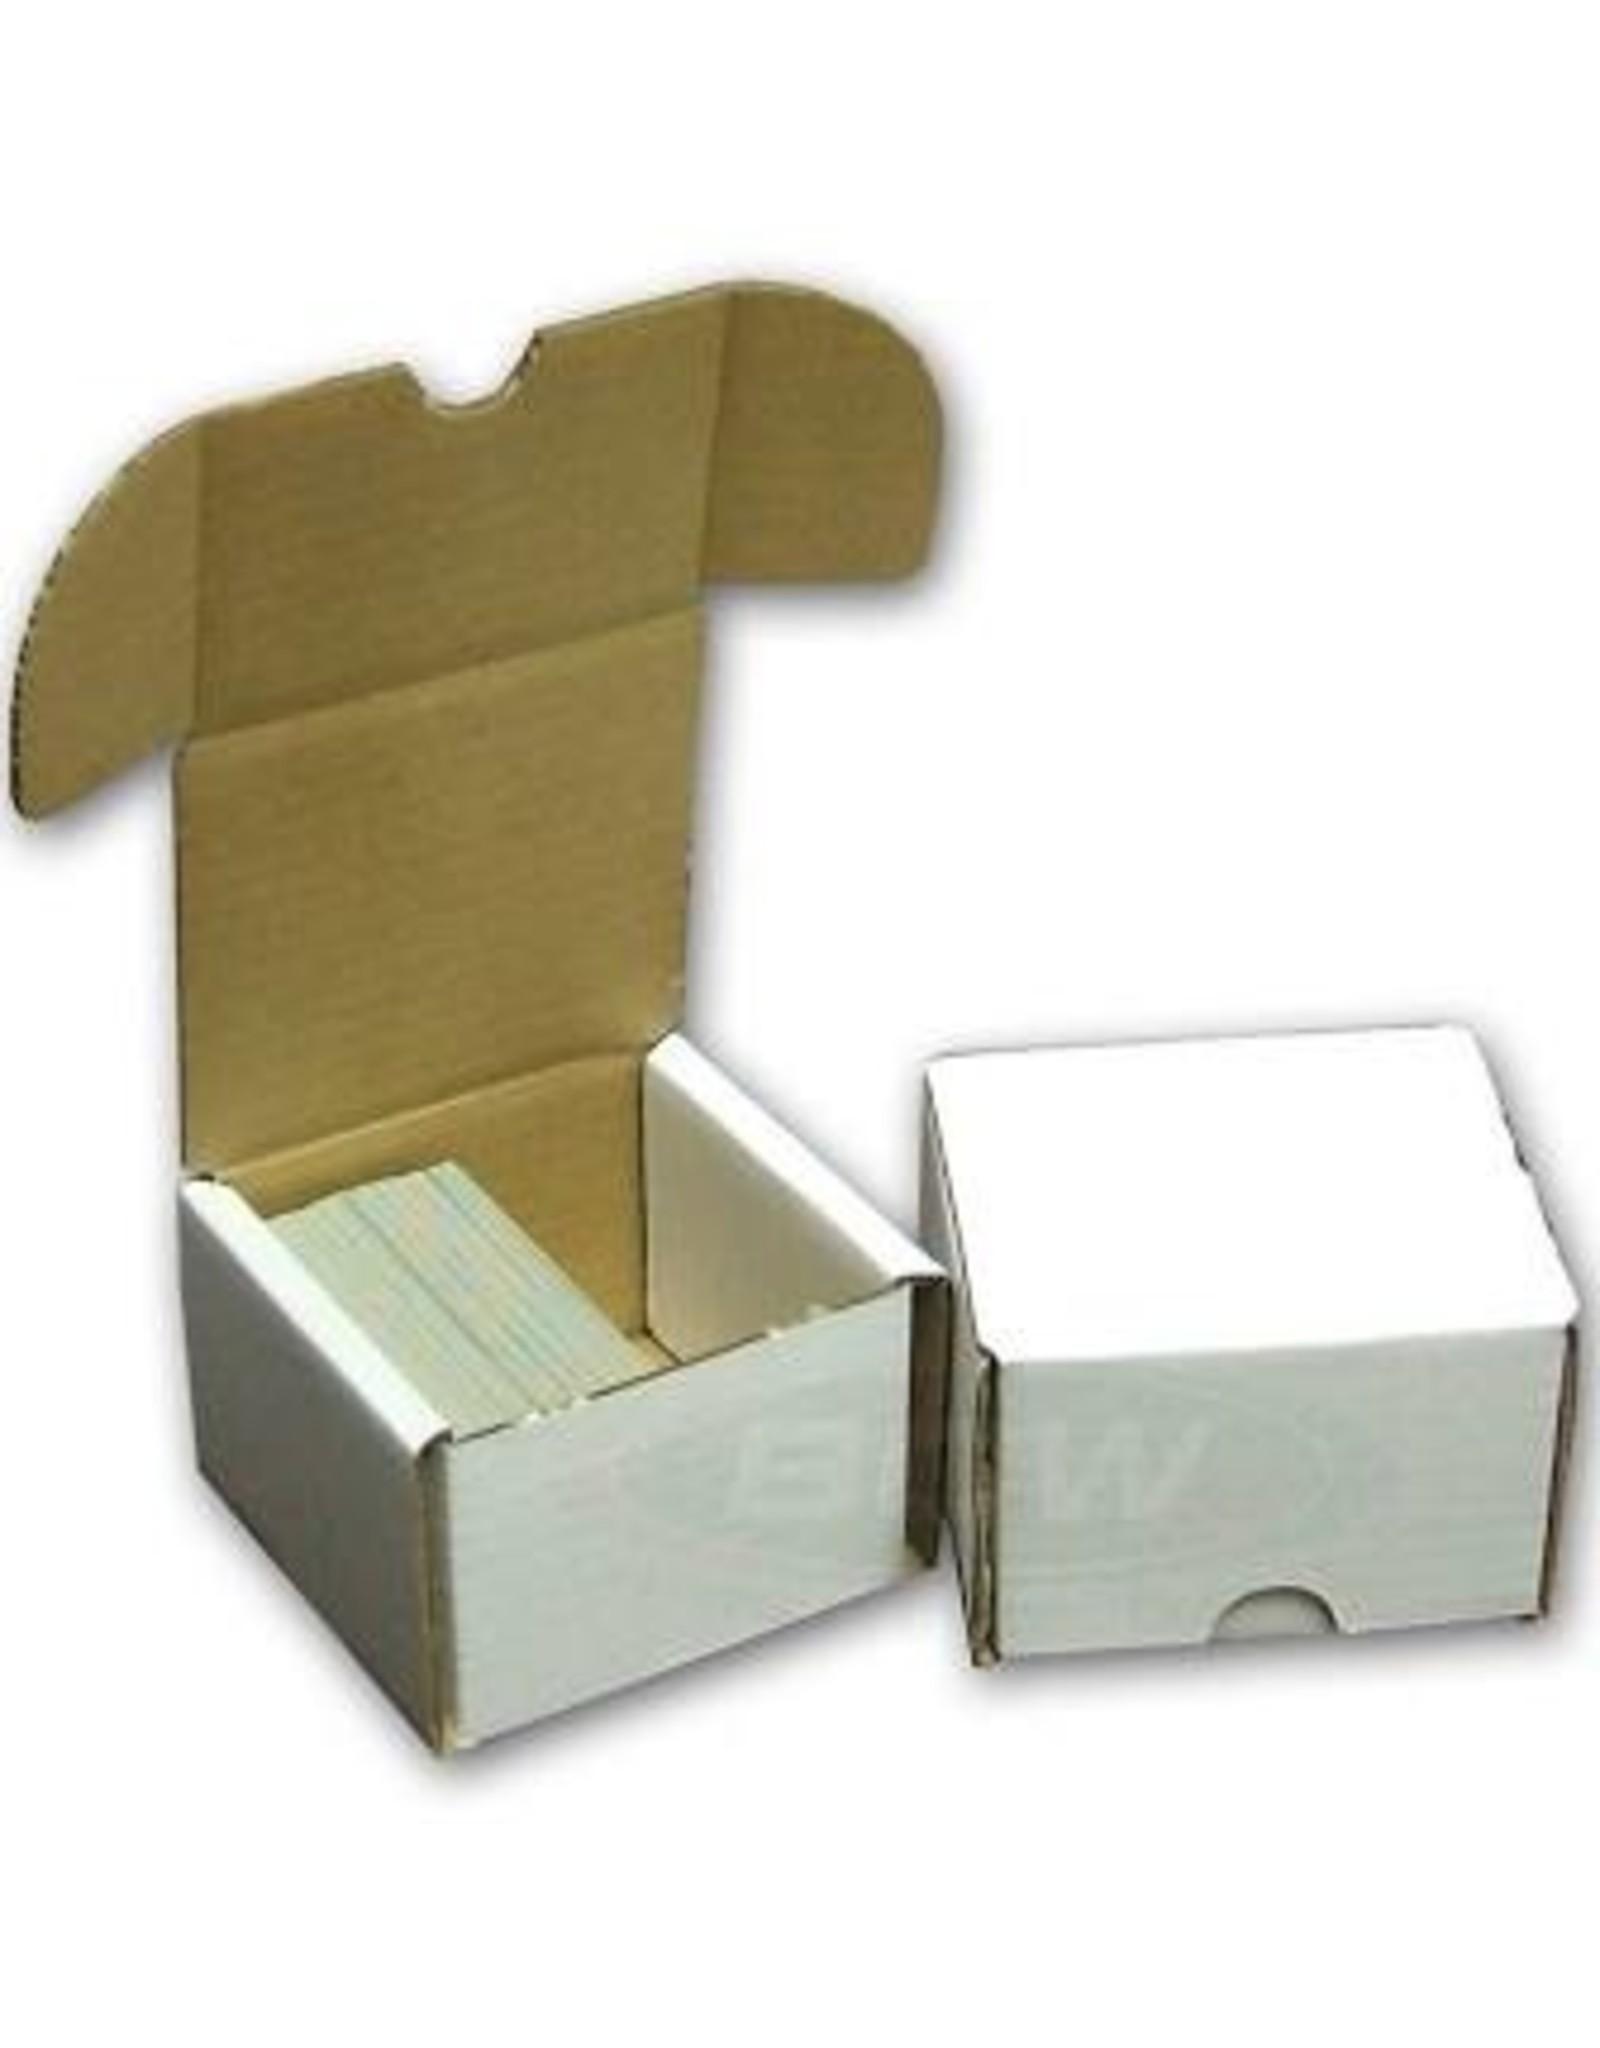 BCD Cardboard Box - 200 Count